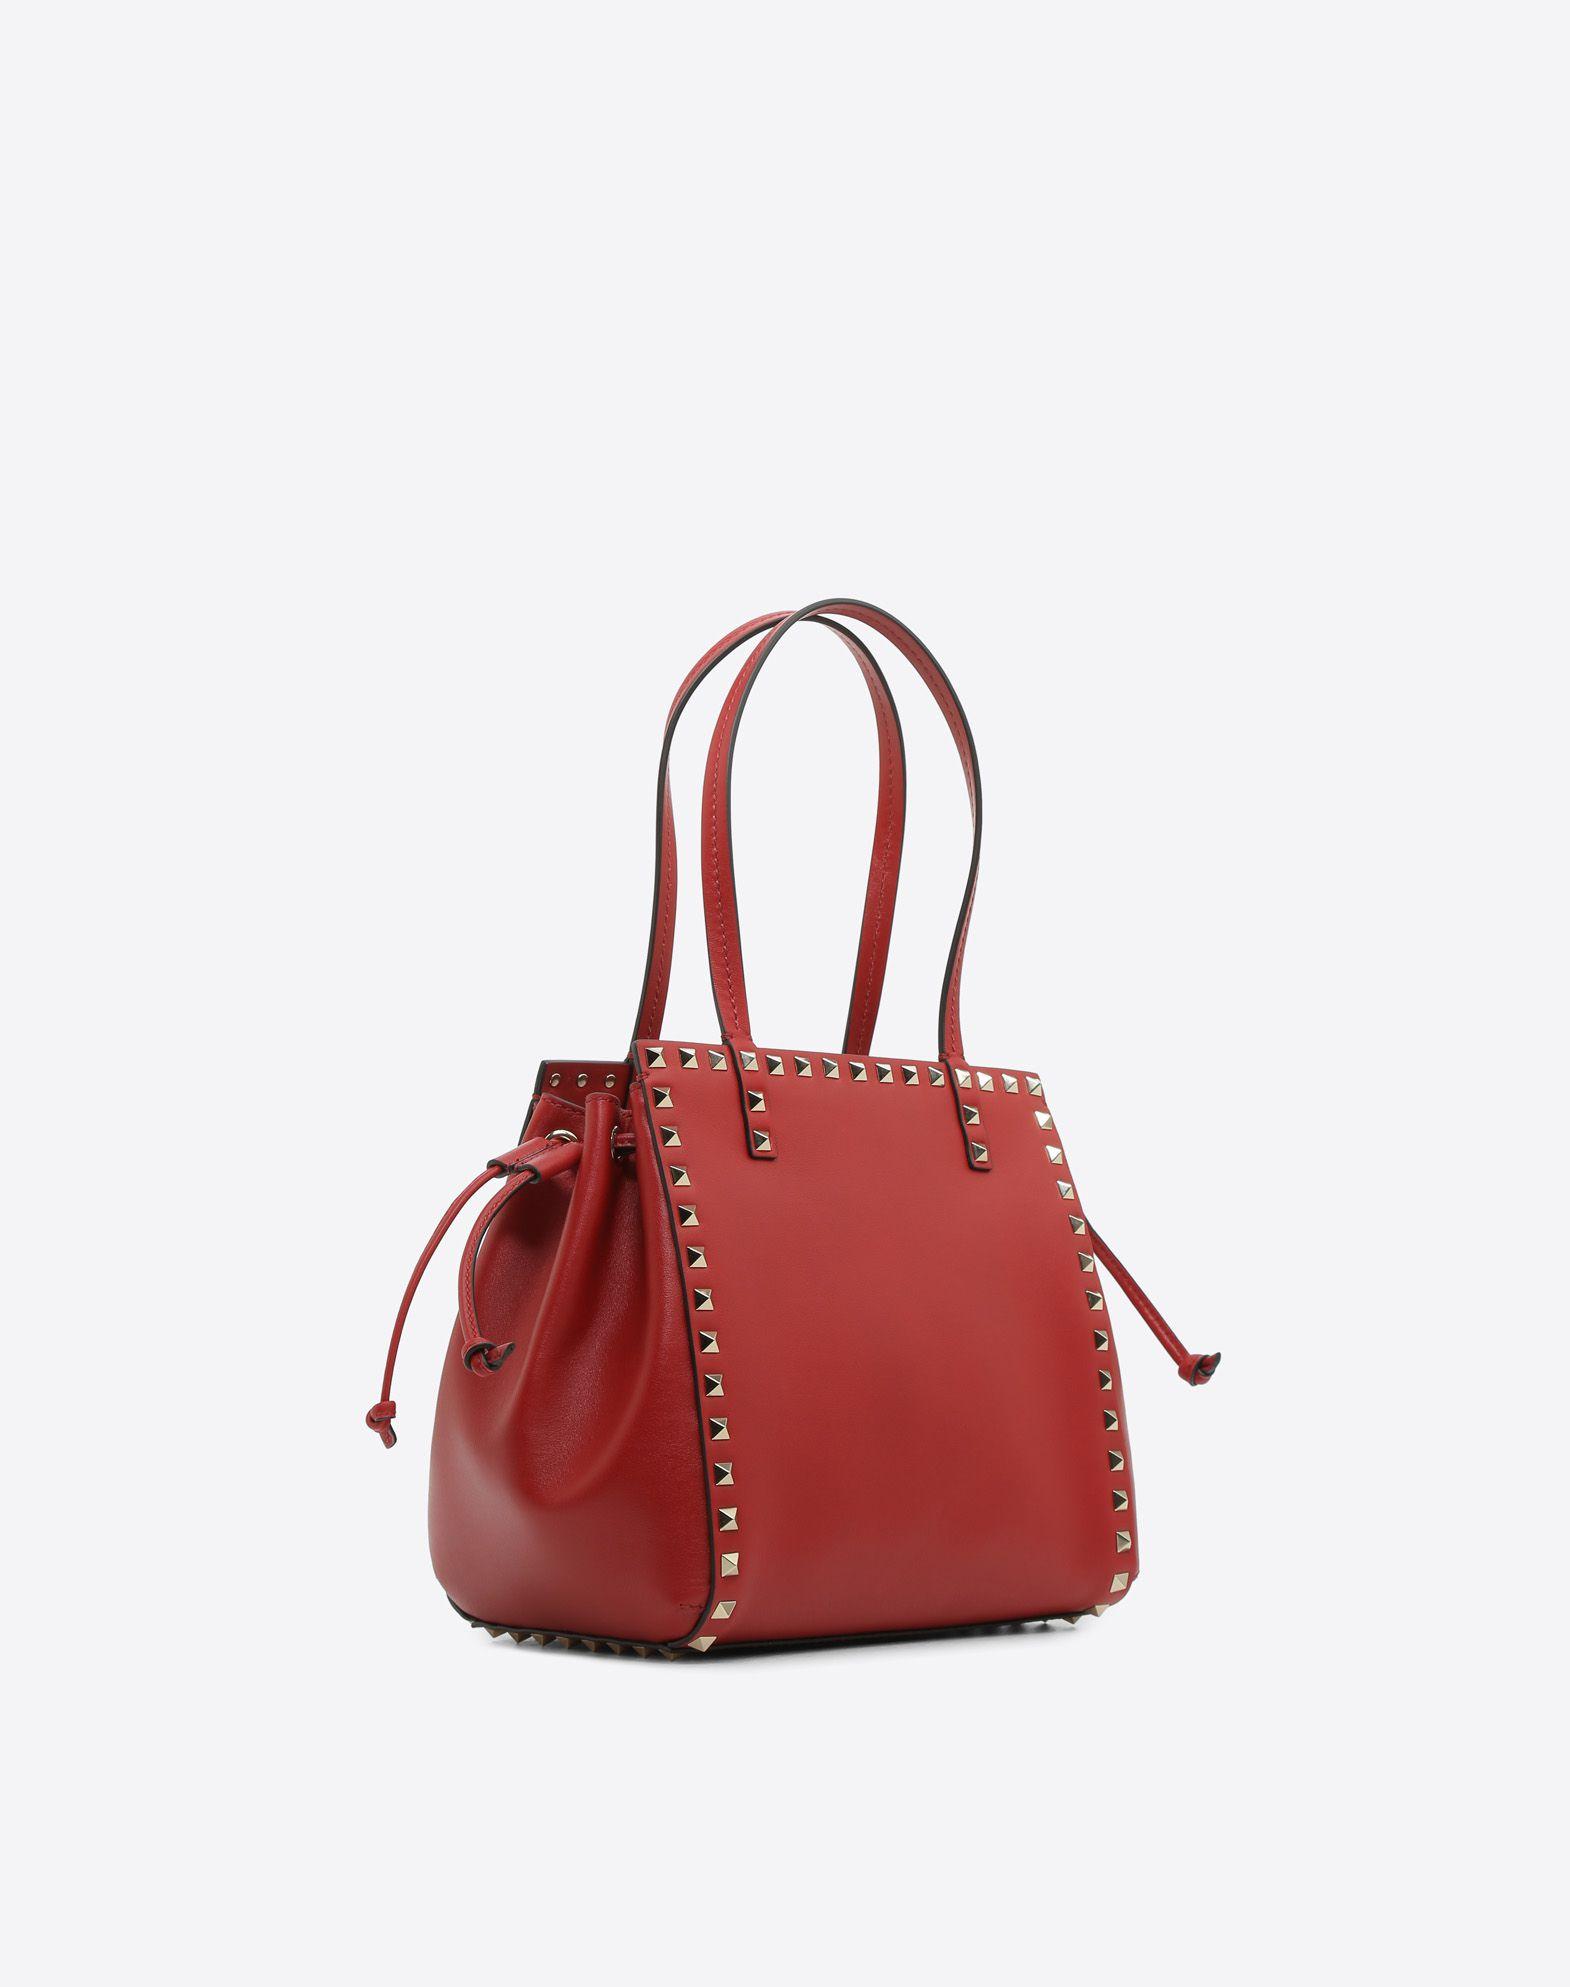 VALENTINO GARAVANI Rockstud Small Double handle Bag HANDBAG D r